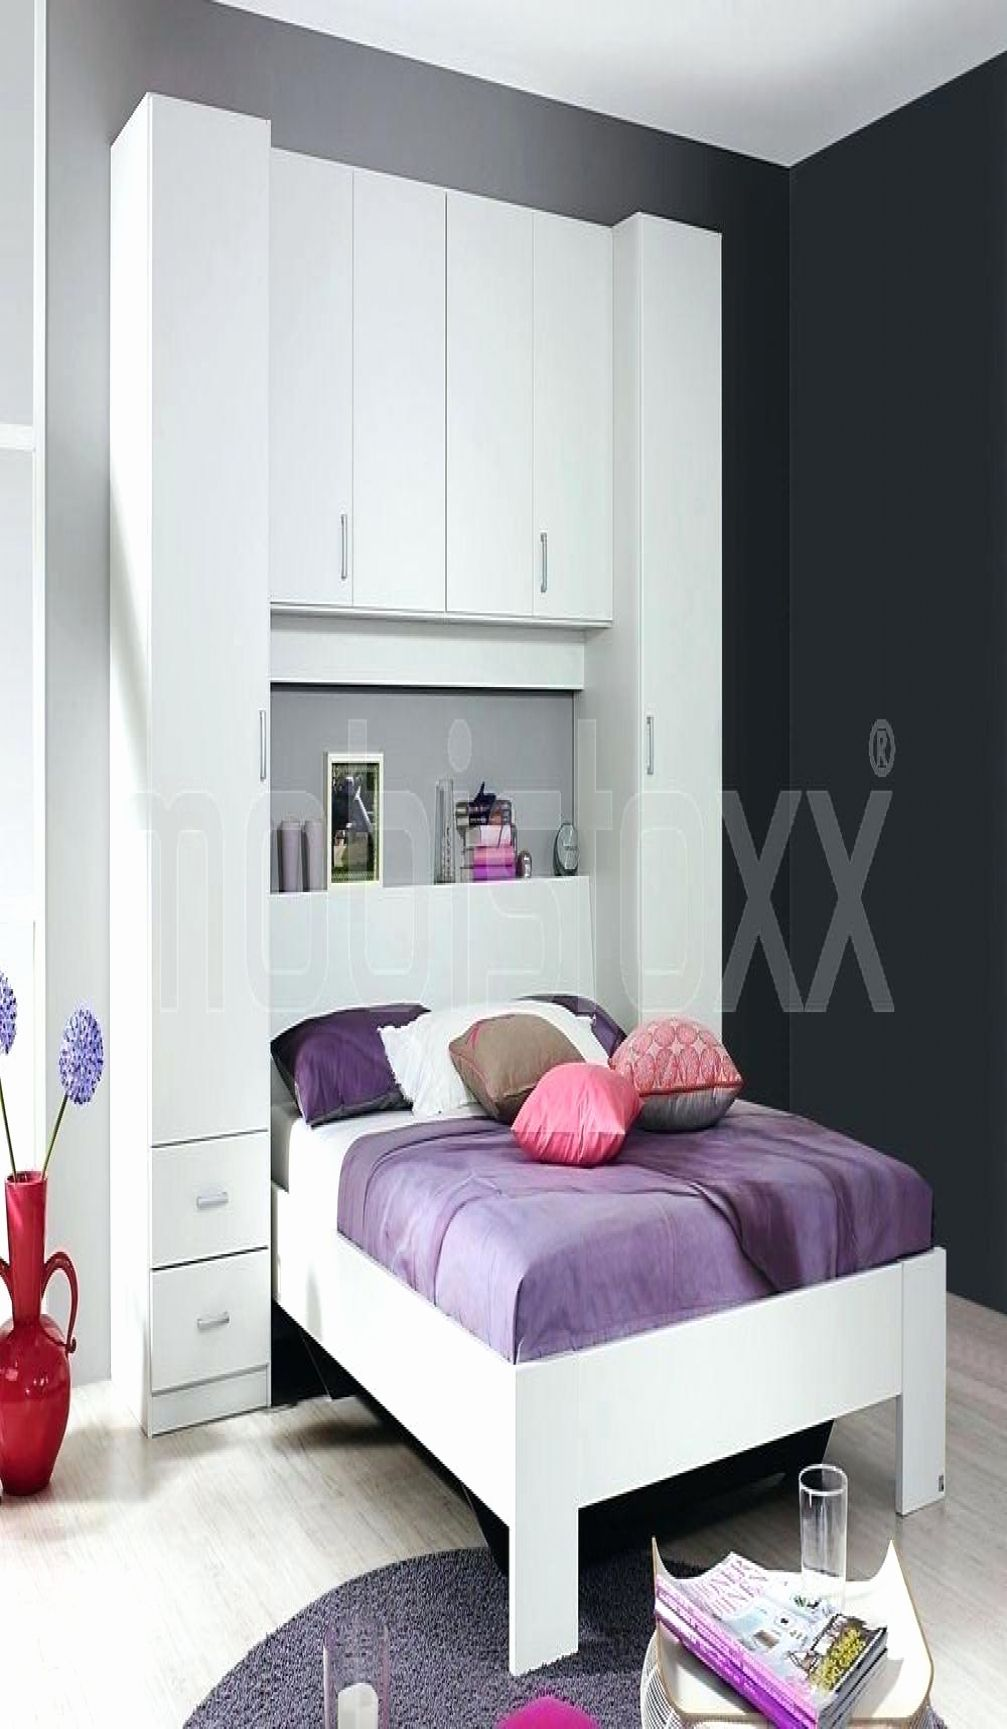 Inspirant Armoire Chambre But Furniture Home Decor Bed